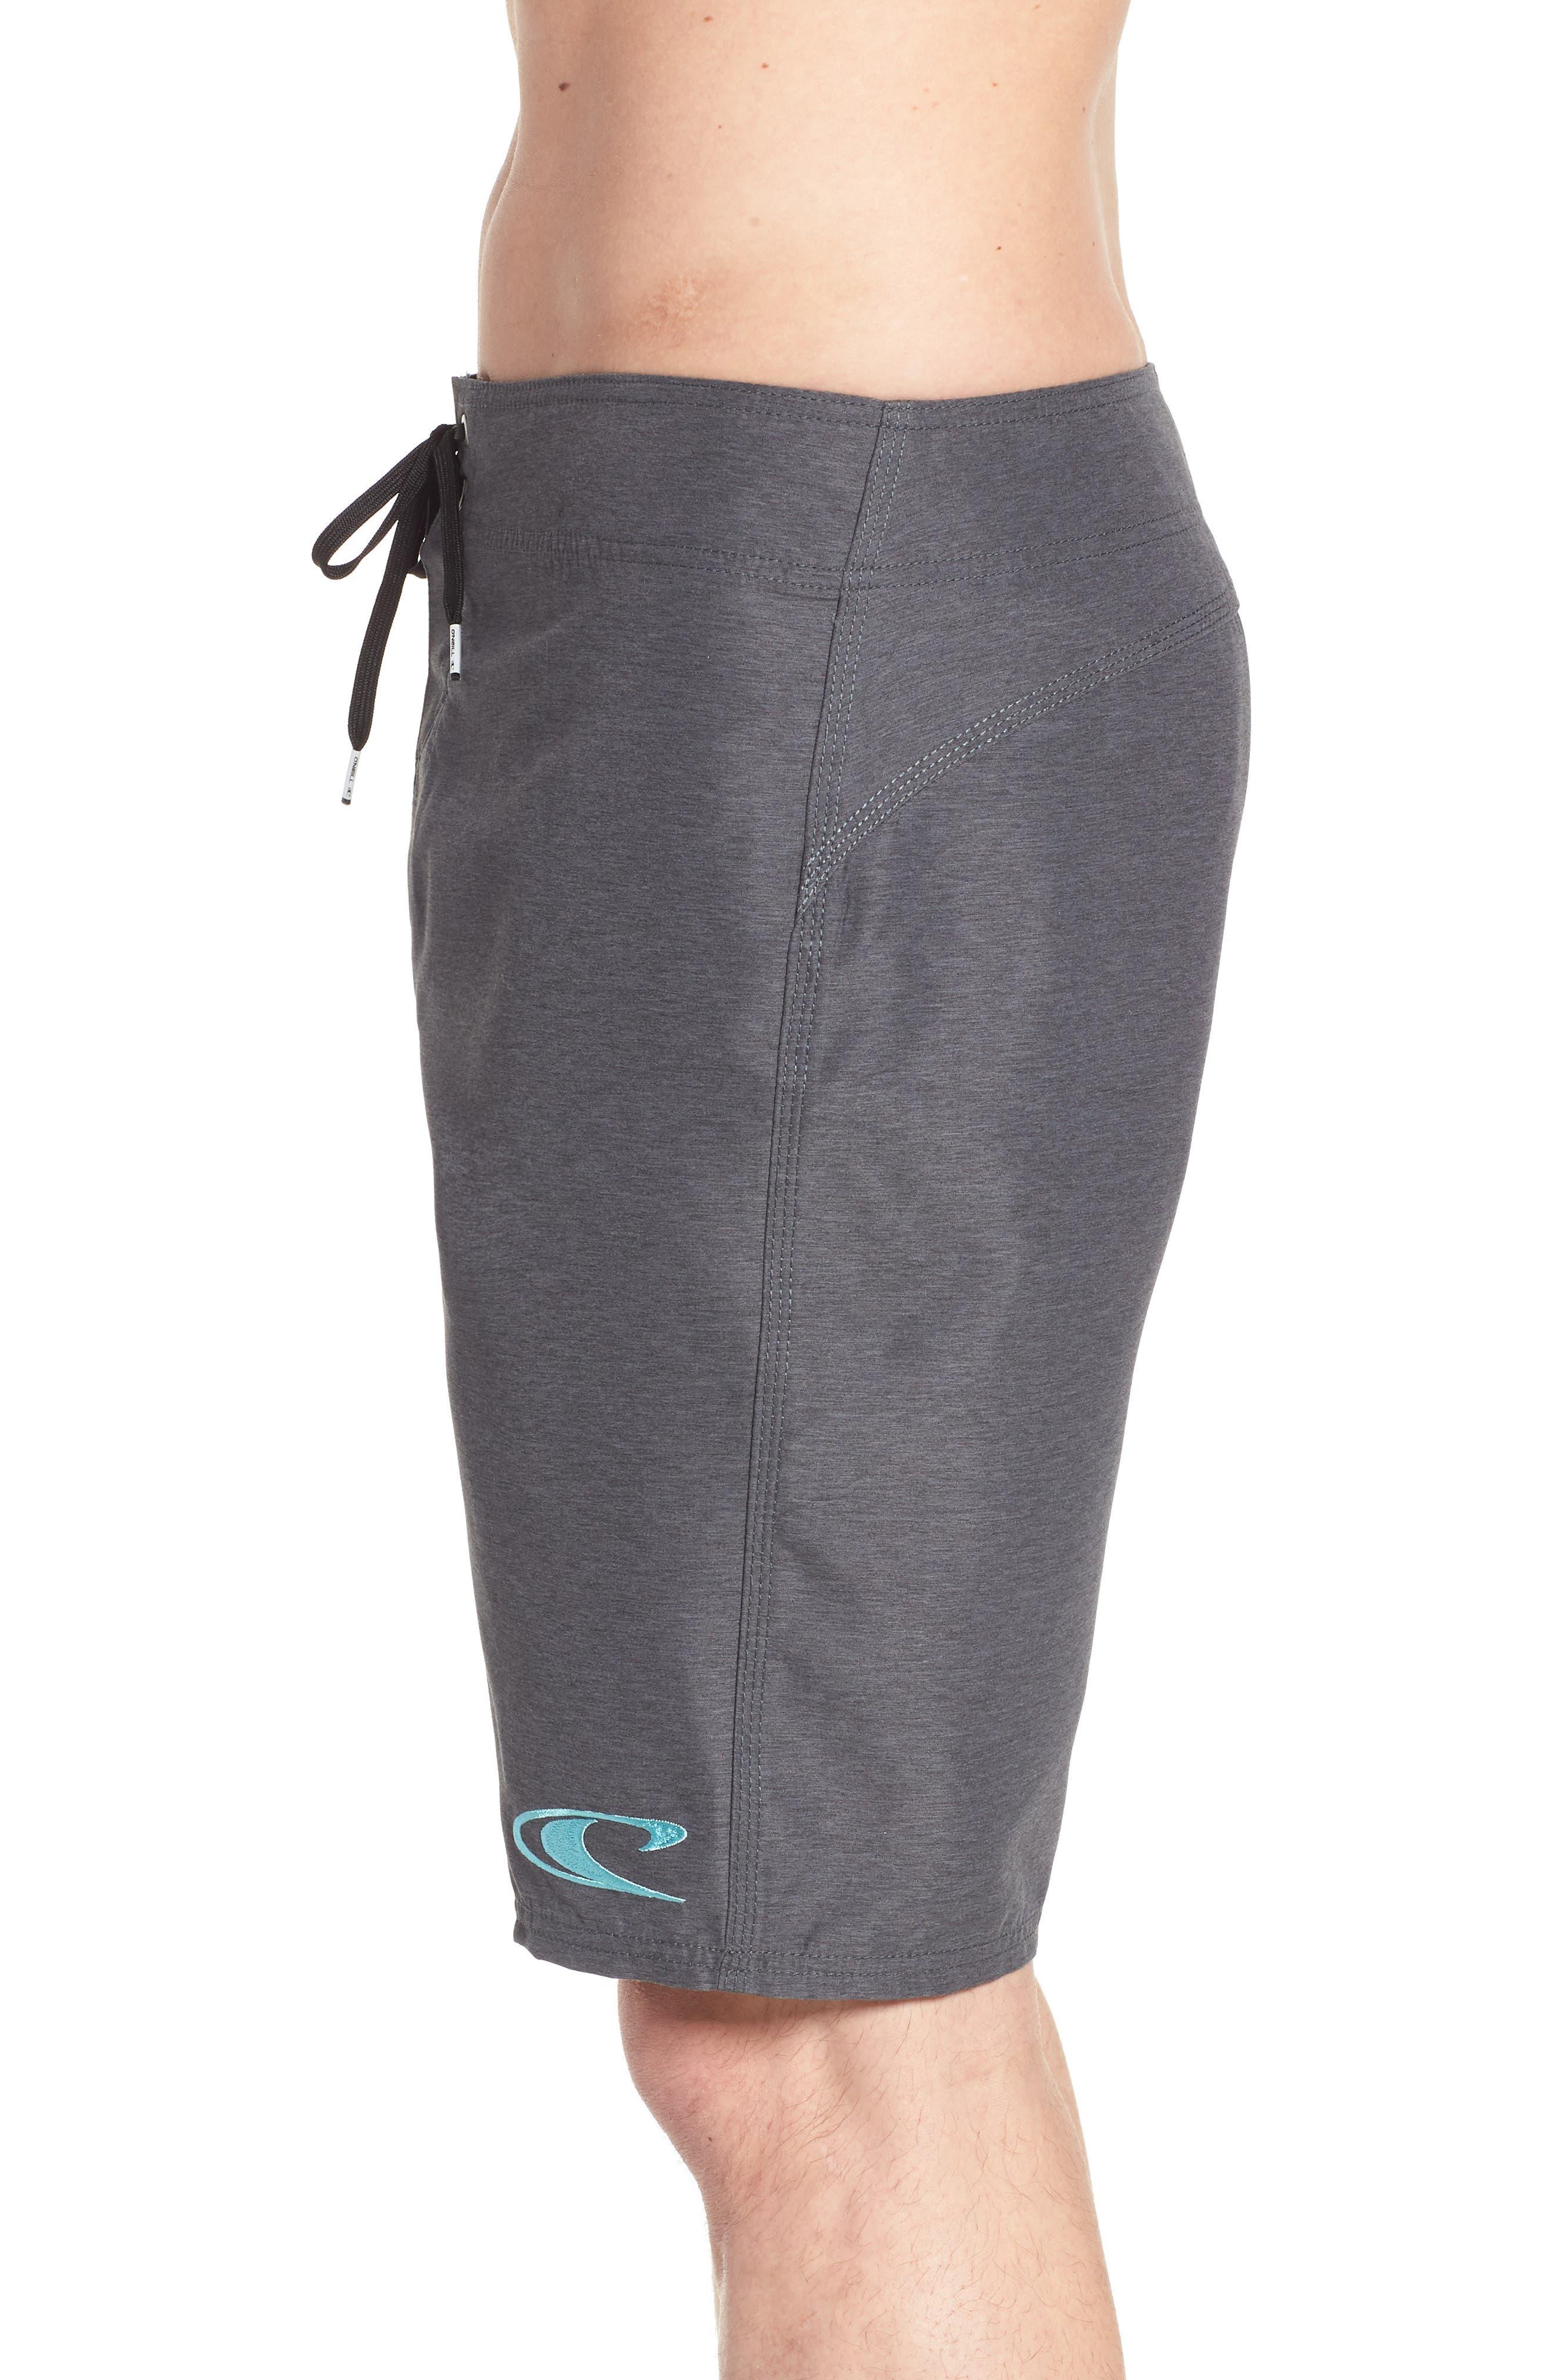 Santa Cruz Board Shorts,                             Alternate thumbnail 4, color,                             001